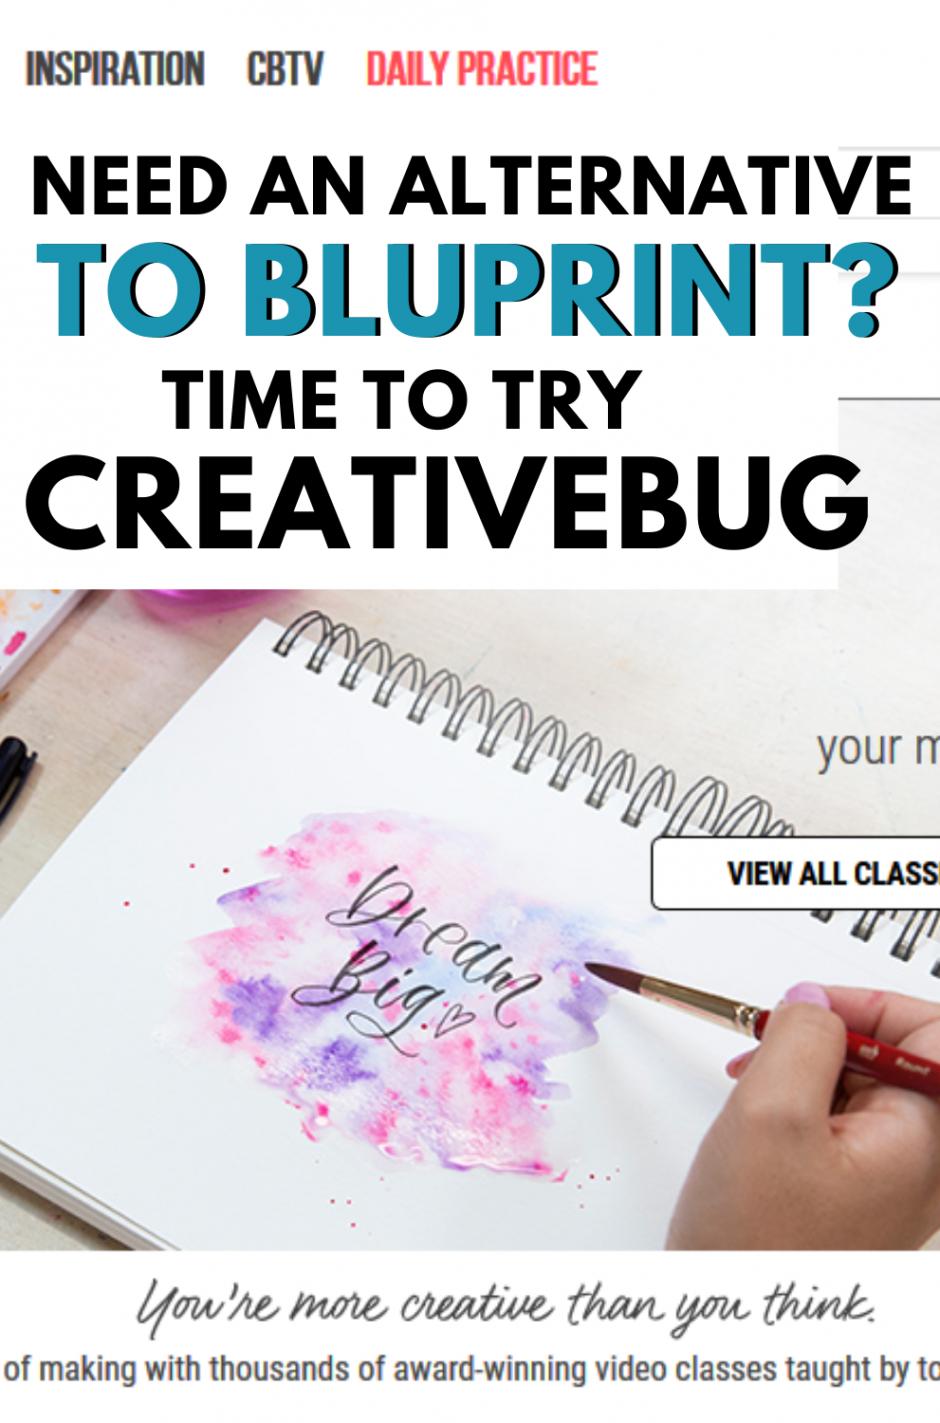 Creativebug as an alternative to Bluprint